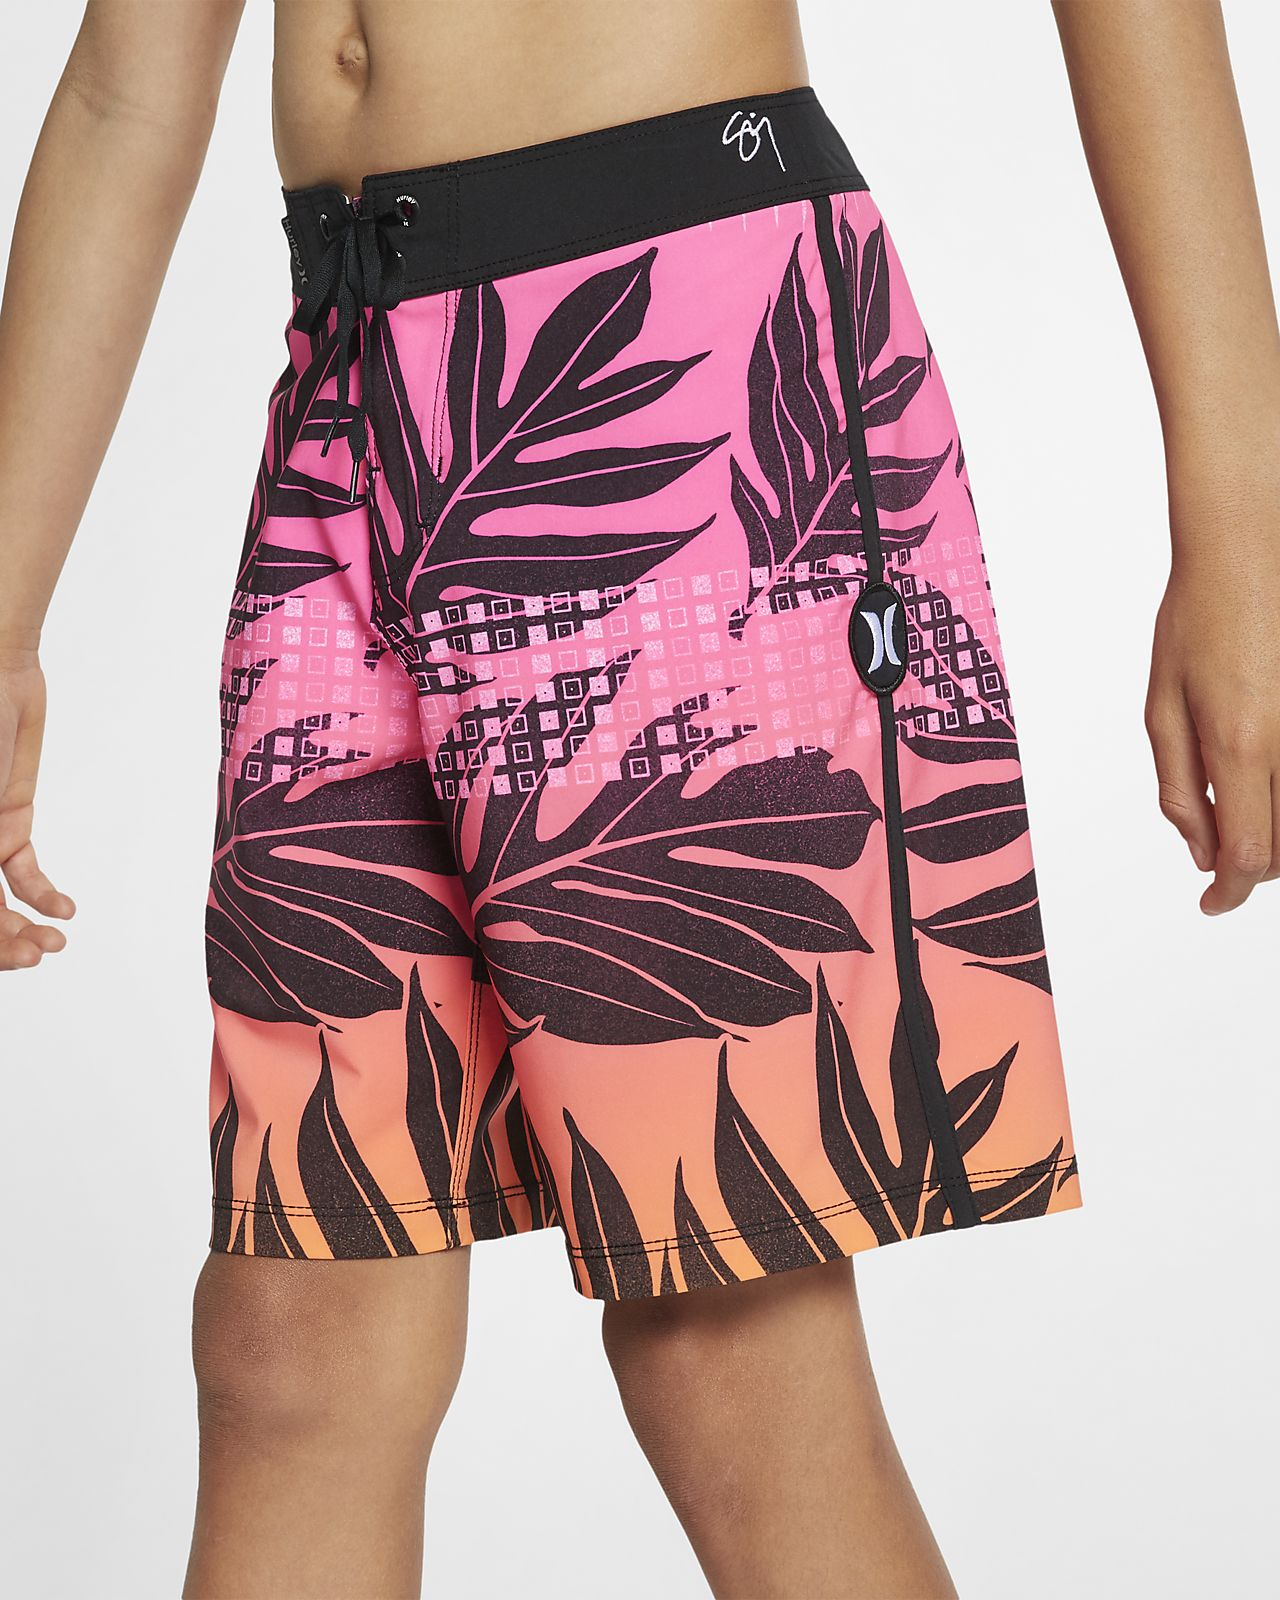 Hurley Phantom Sig Zane Moorea Boardshorts für Jungen (ca. 40,5 cm)